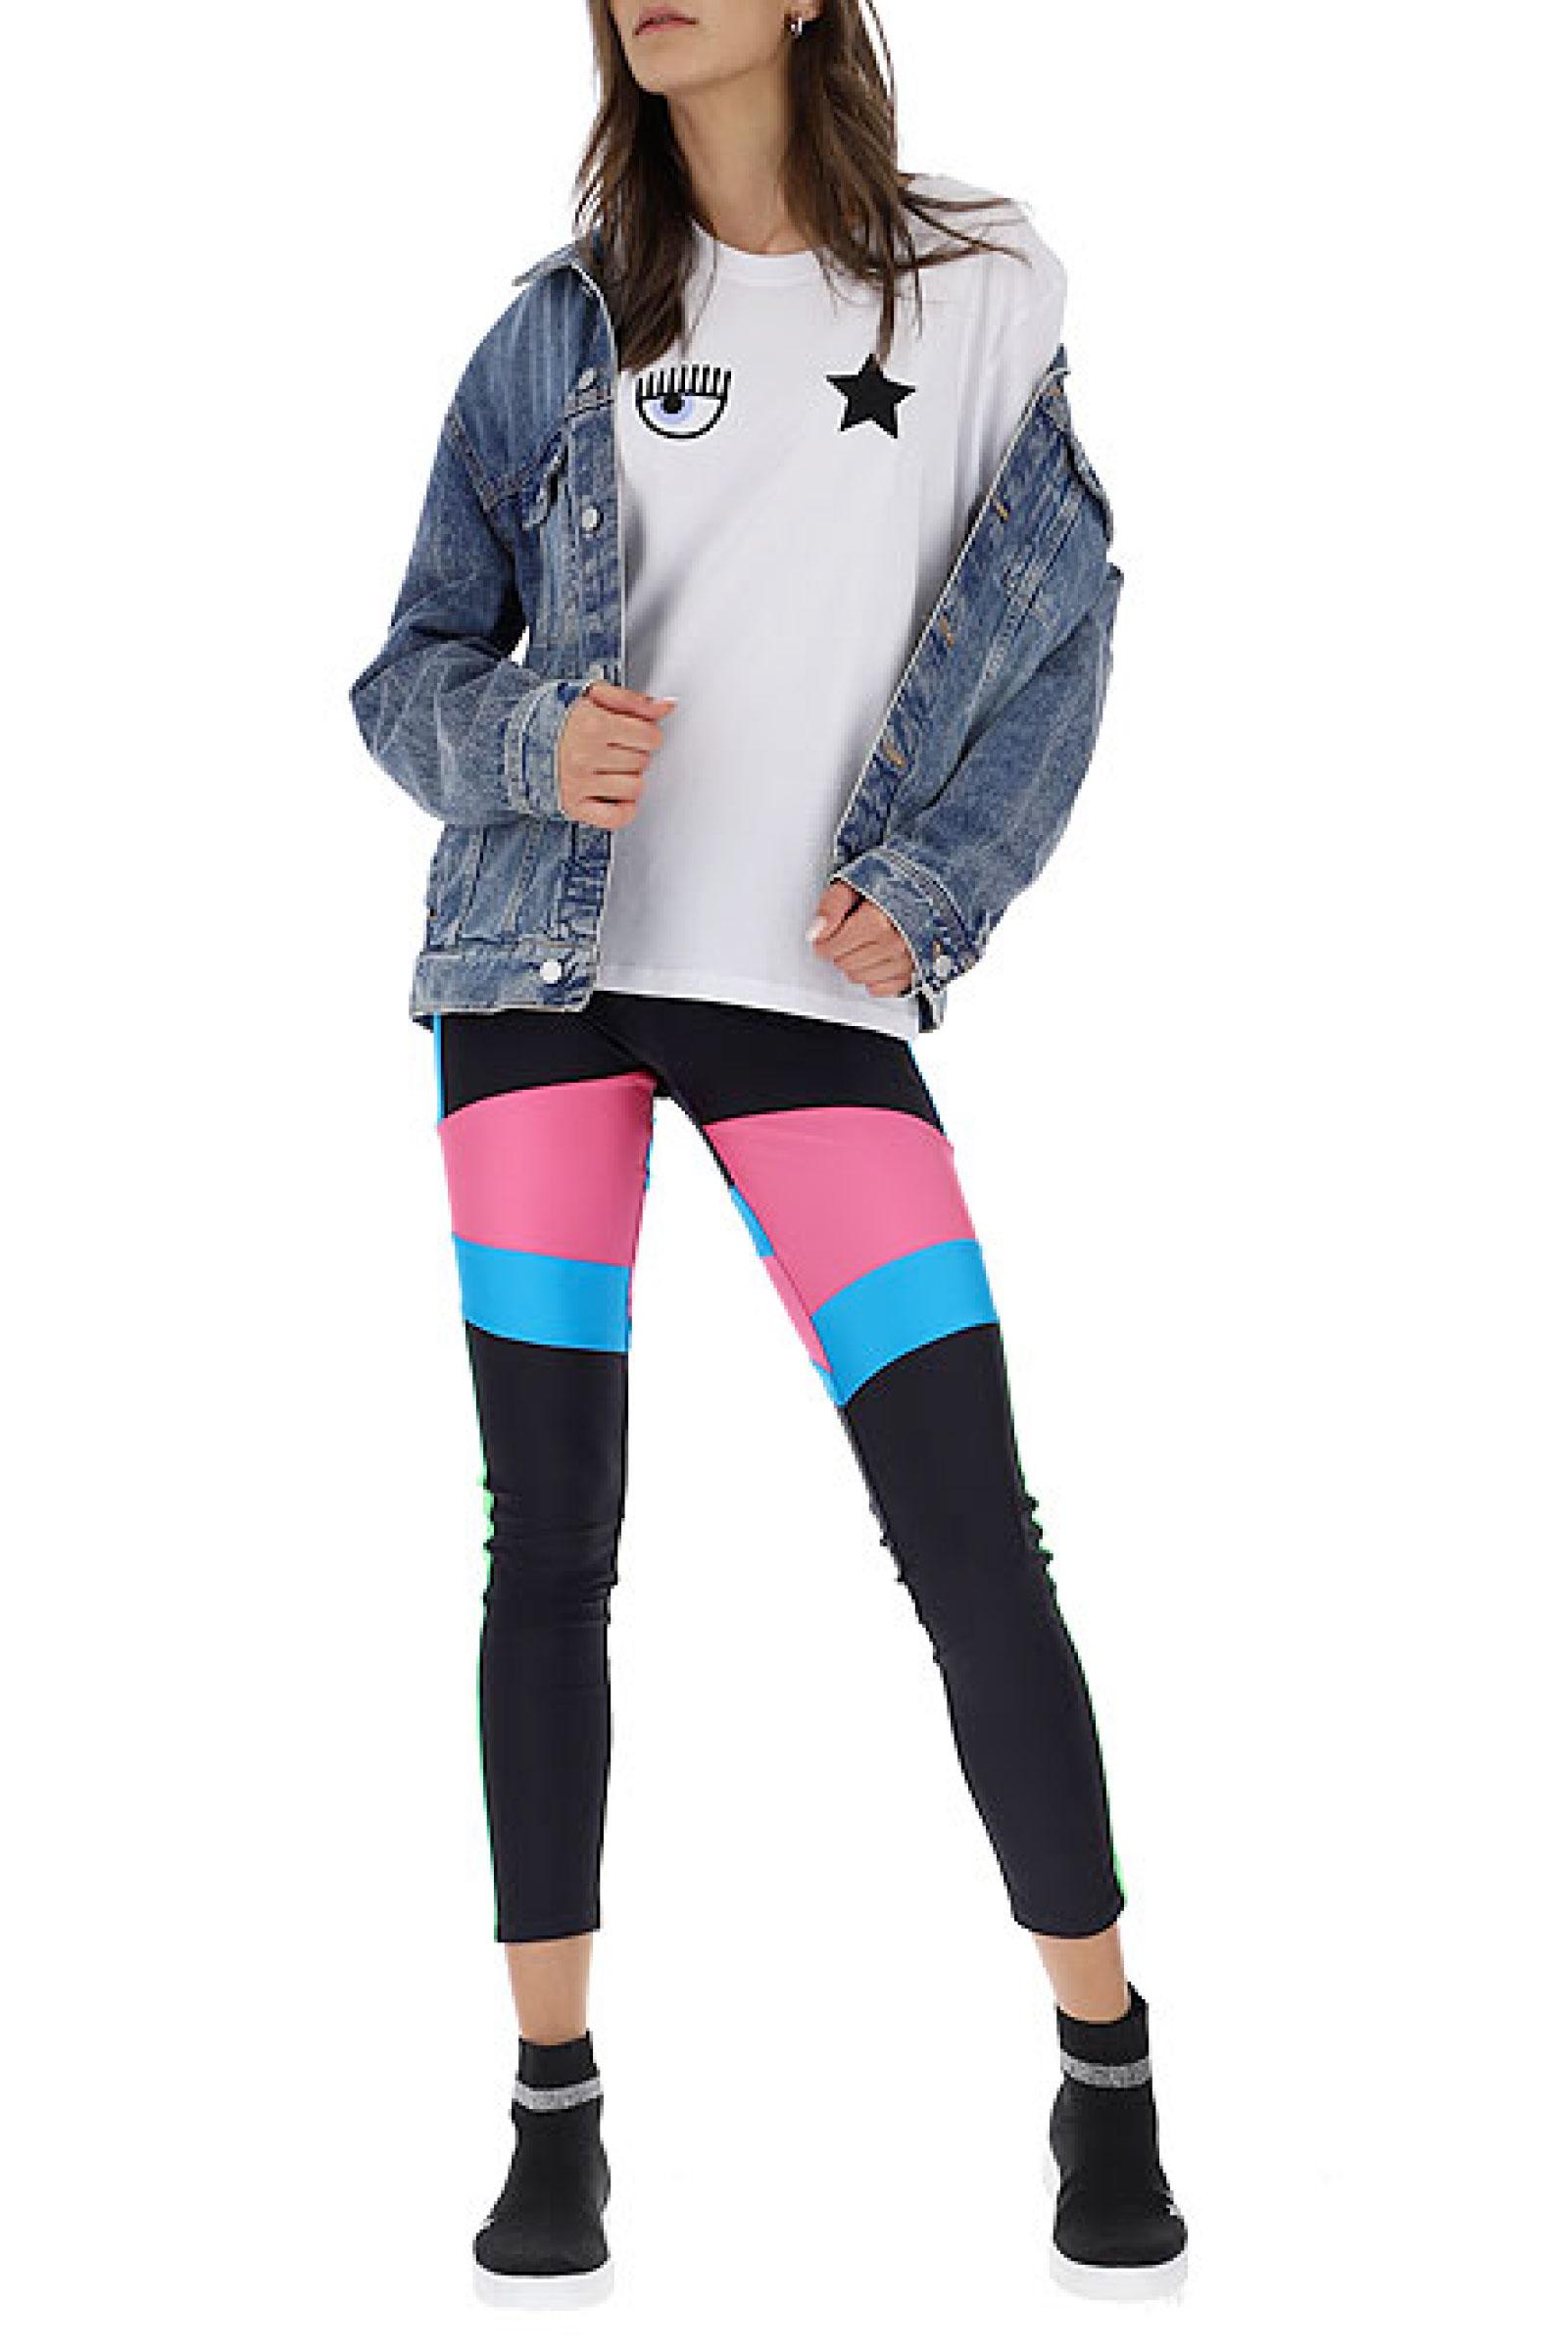 Leggings Donna CHIARA FERRAGNI   Leggings   71CBC106 N0008899